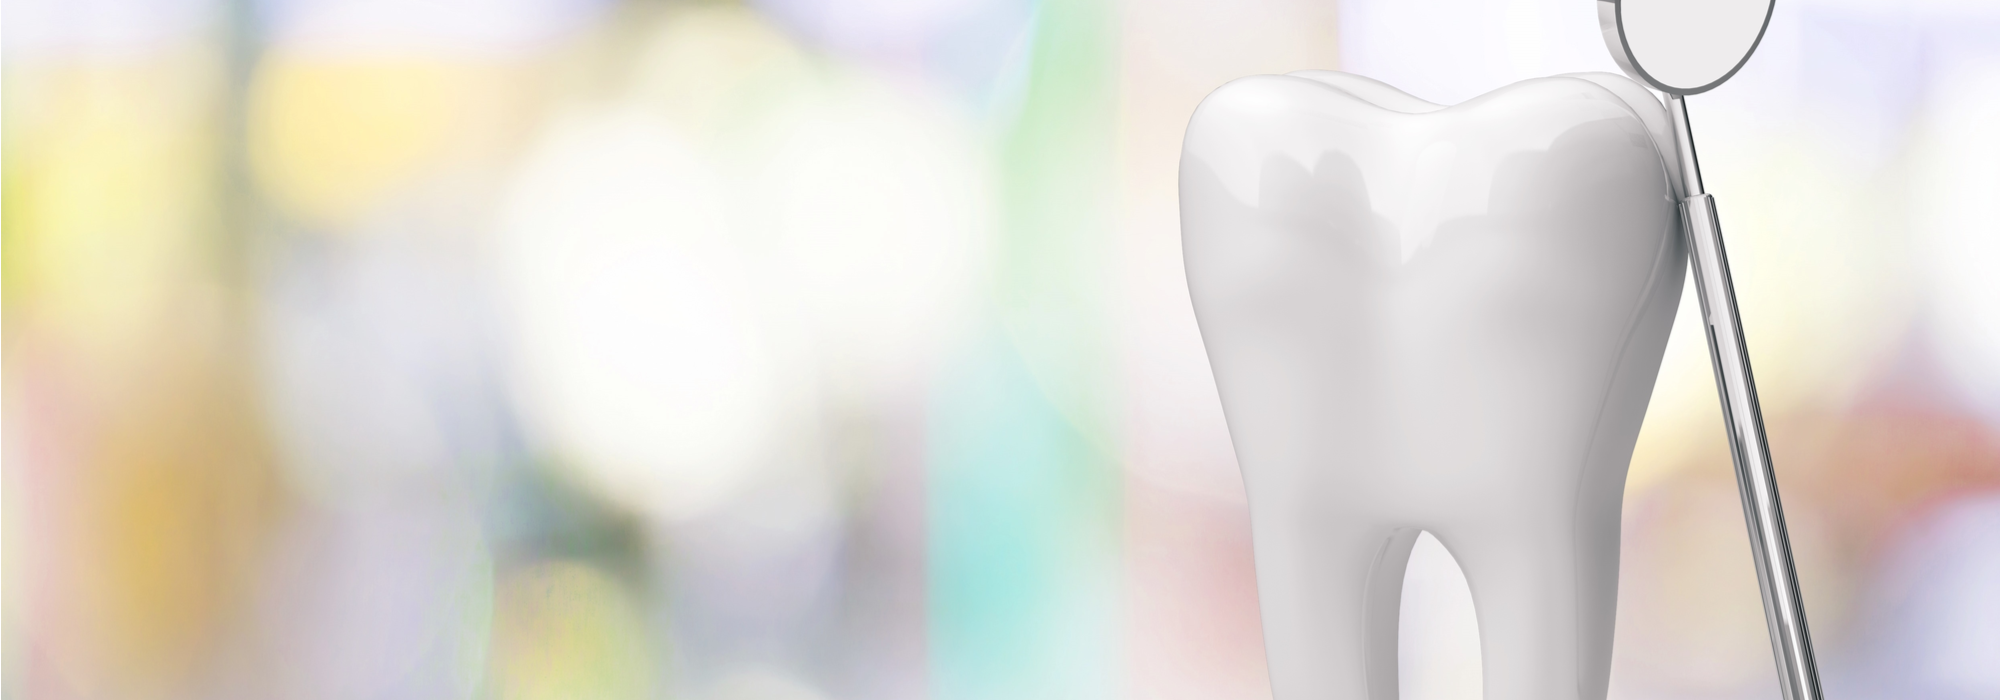 Free-Dental-Care